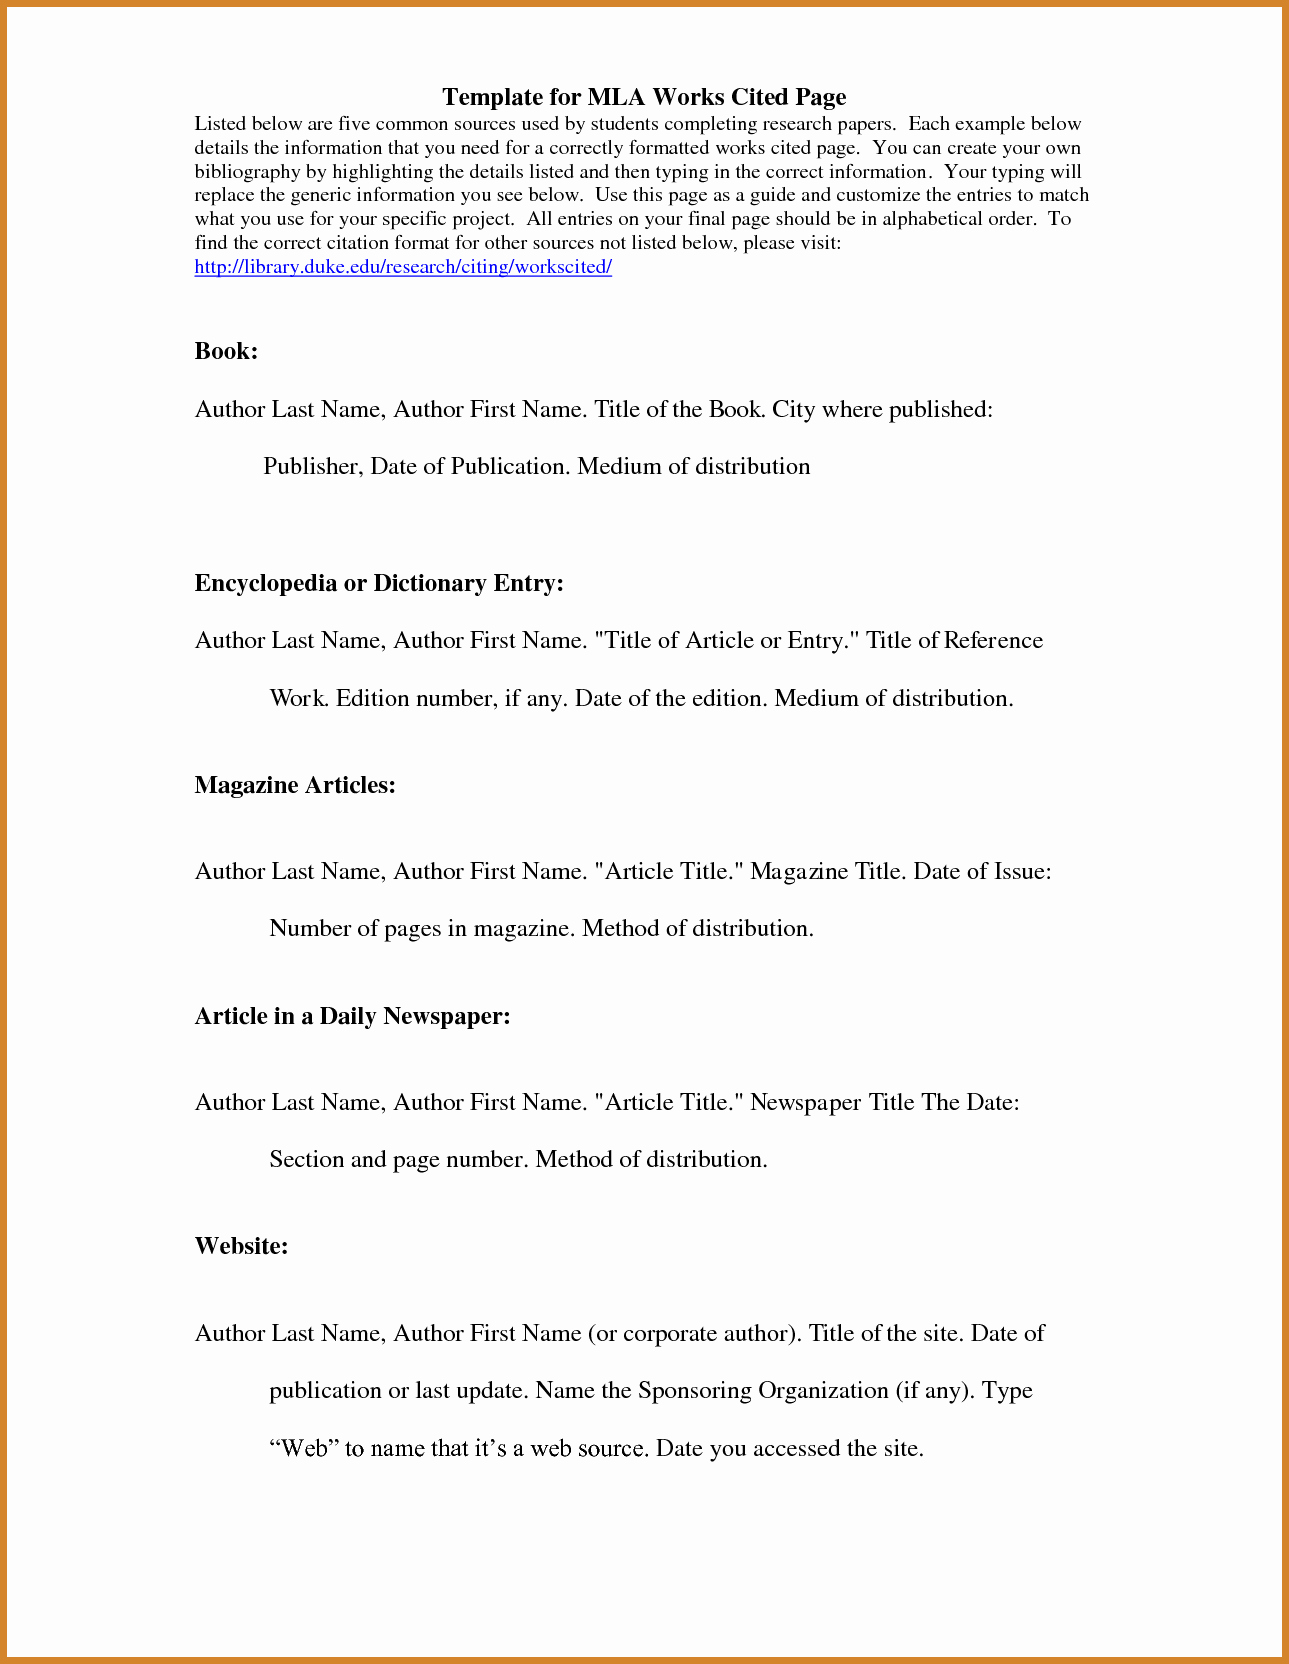 Mla Works Cited Page Template Elegant Mla Works Cited Page Template Templates Data